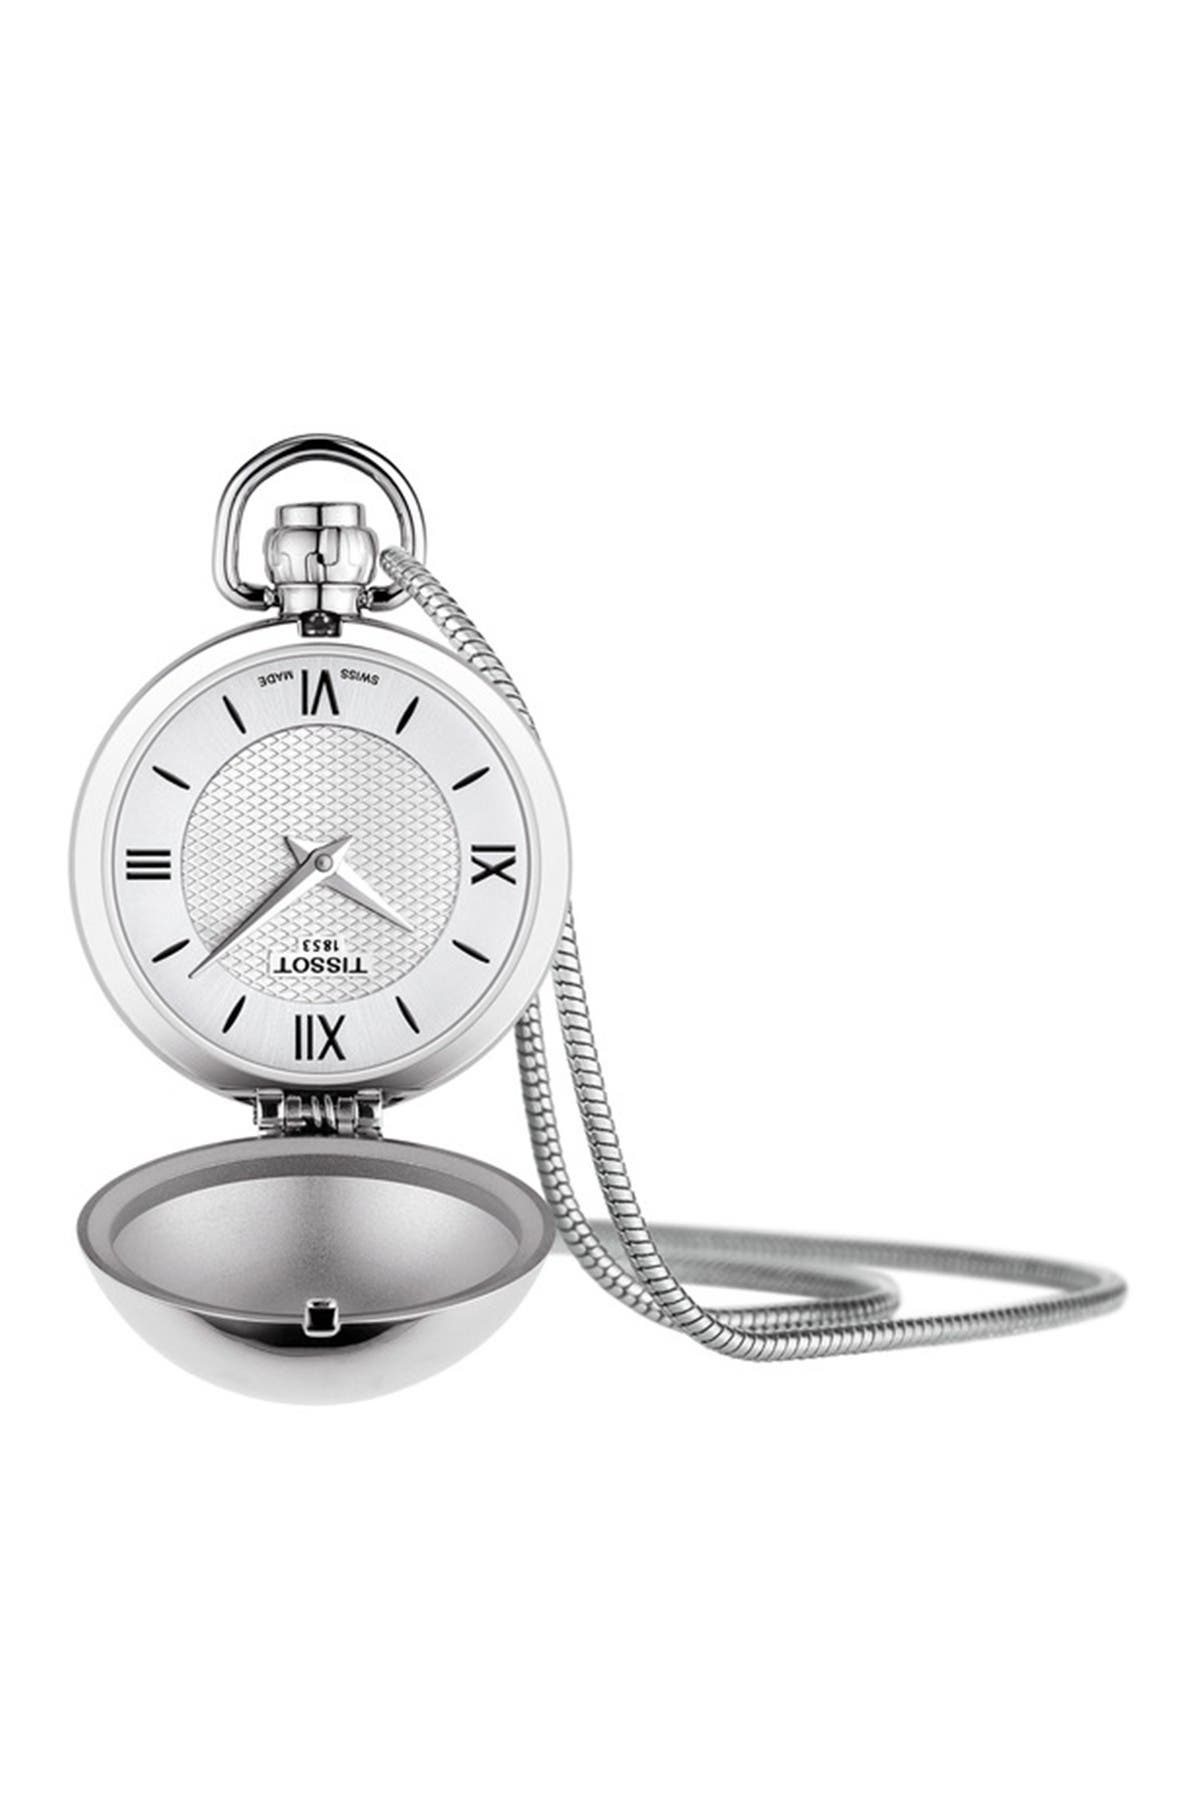 Image of Tissot Women's Pendants Pocket Watch, 22mm